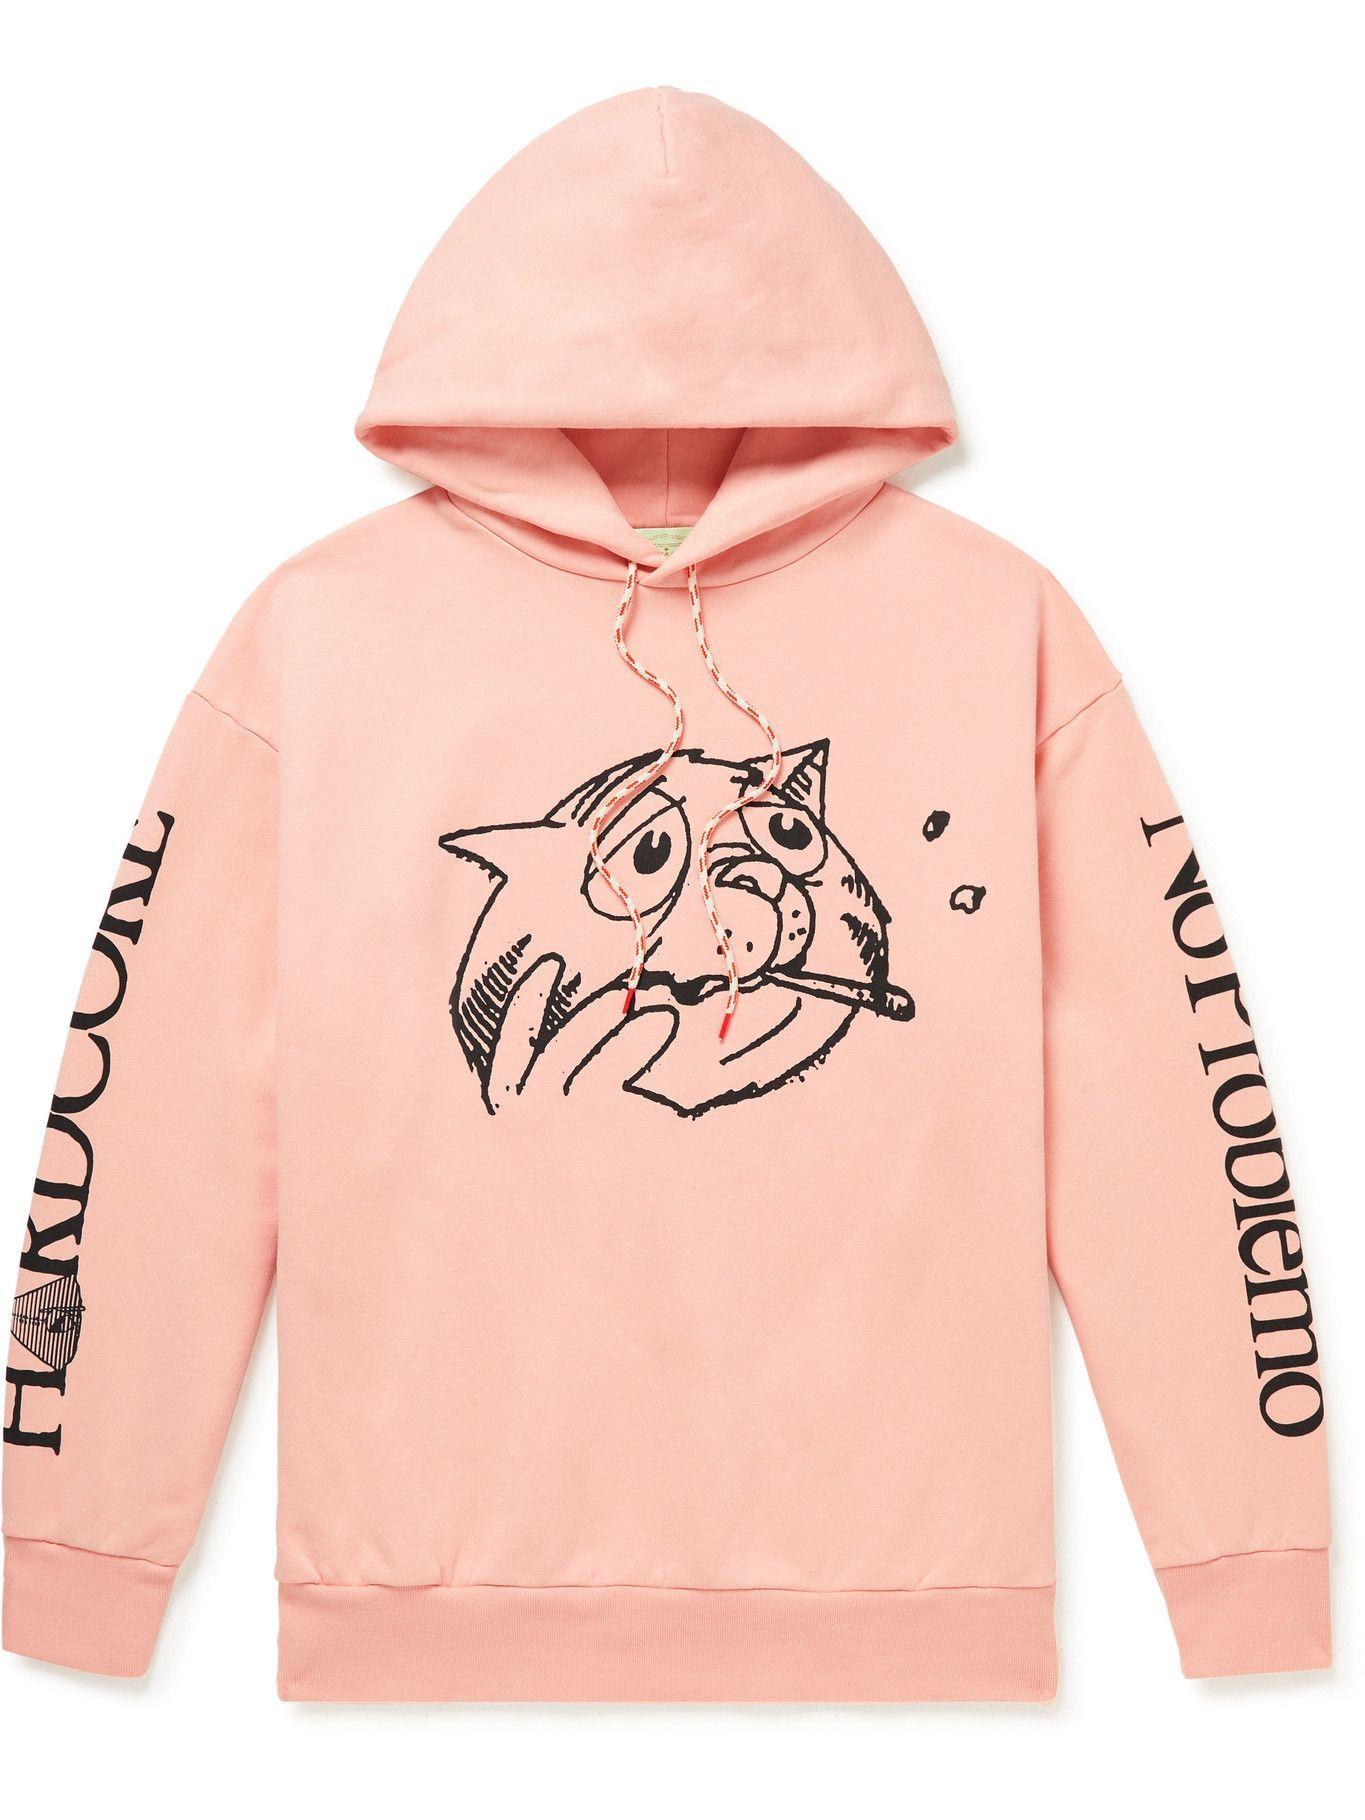 Aries - Printed Cotton-Jersey Hoodie - Pink